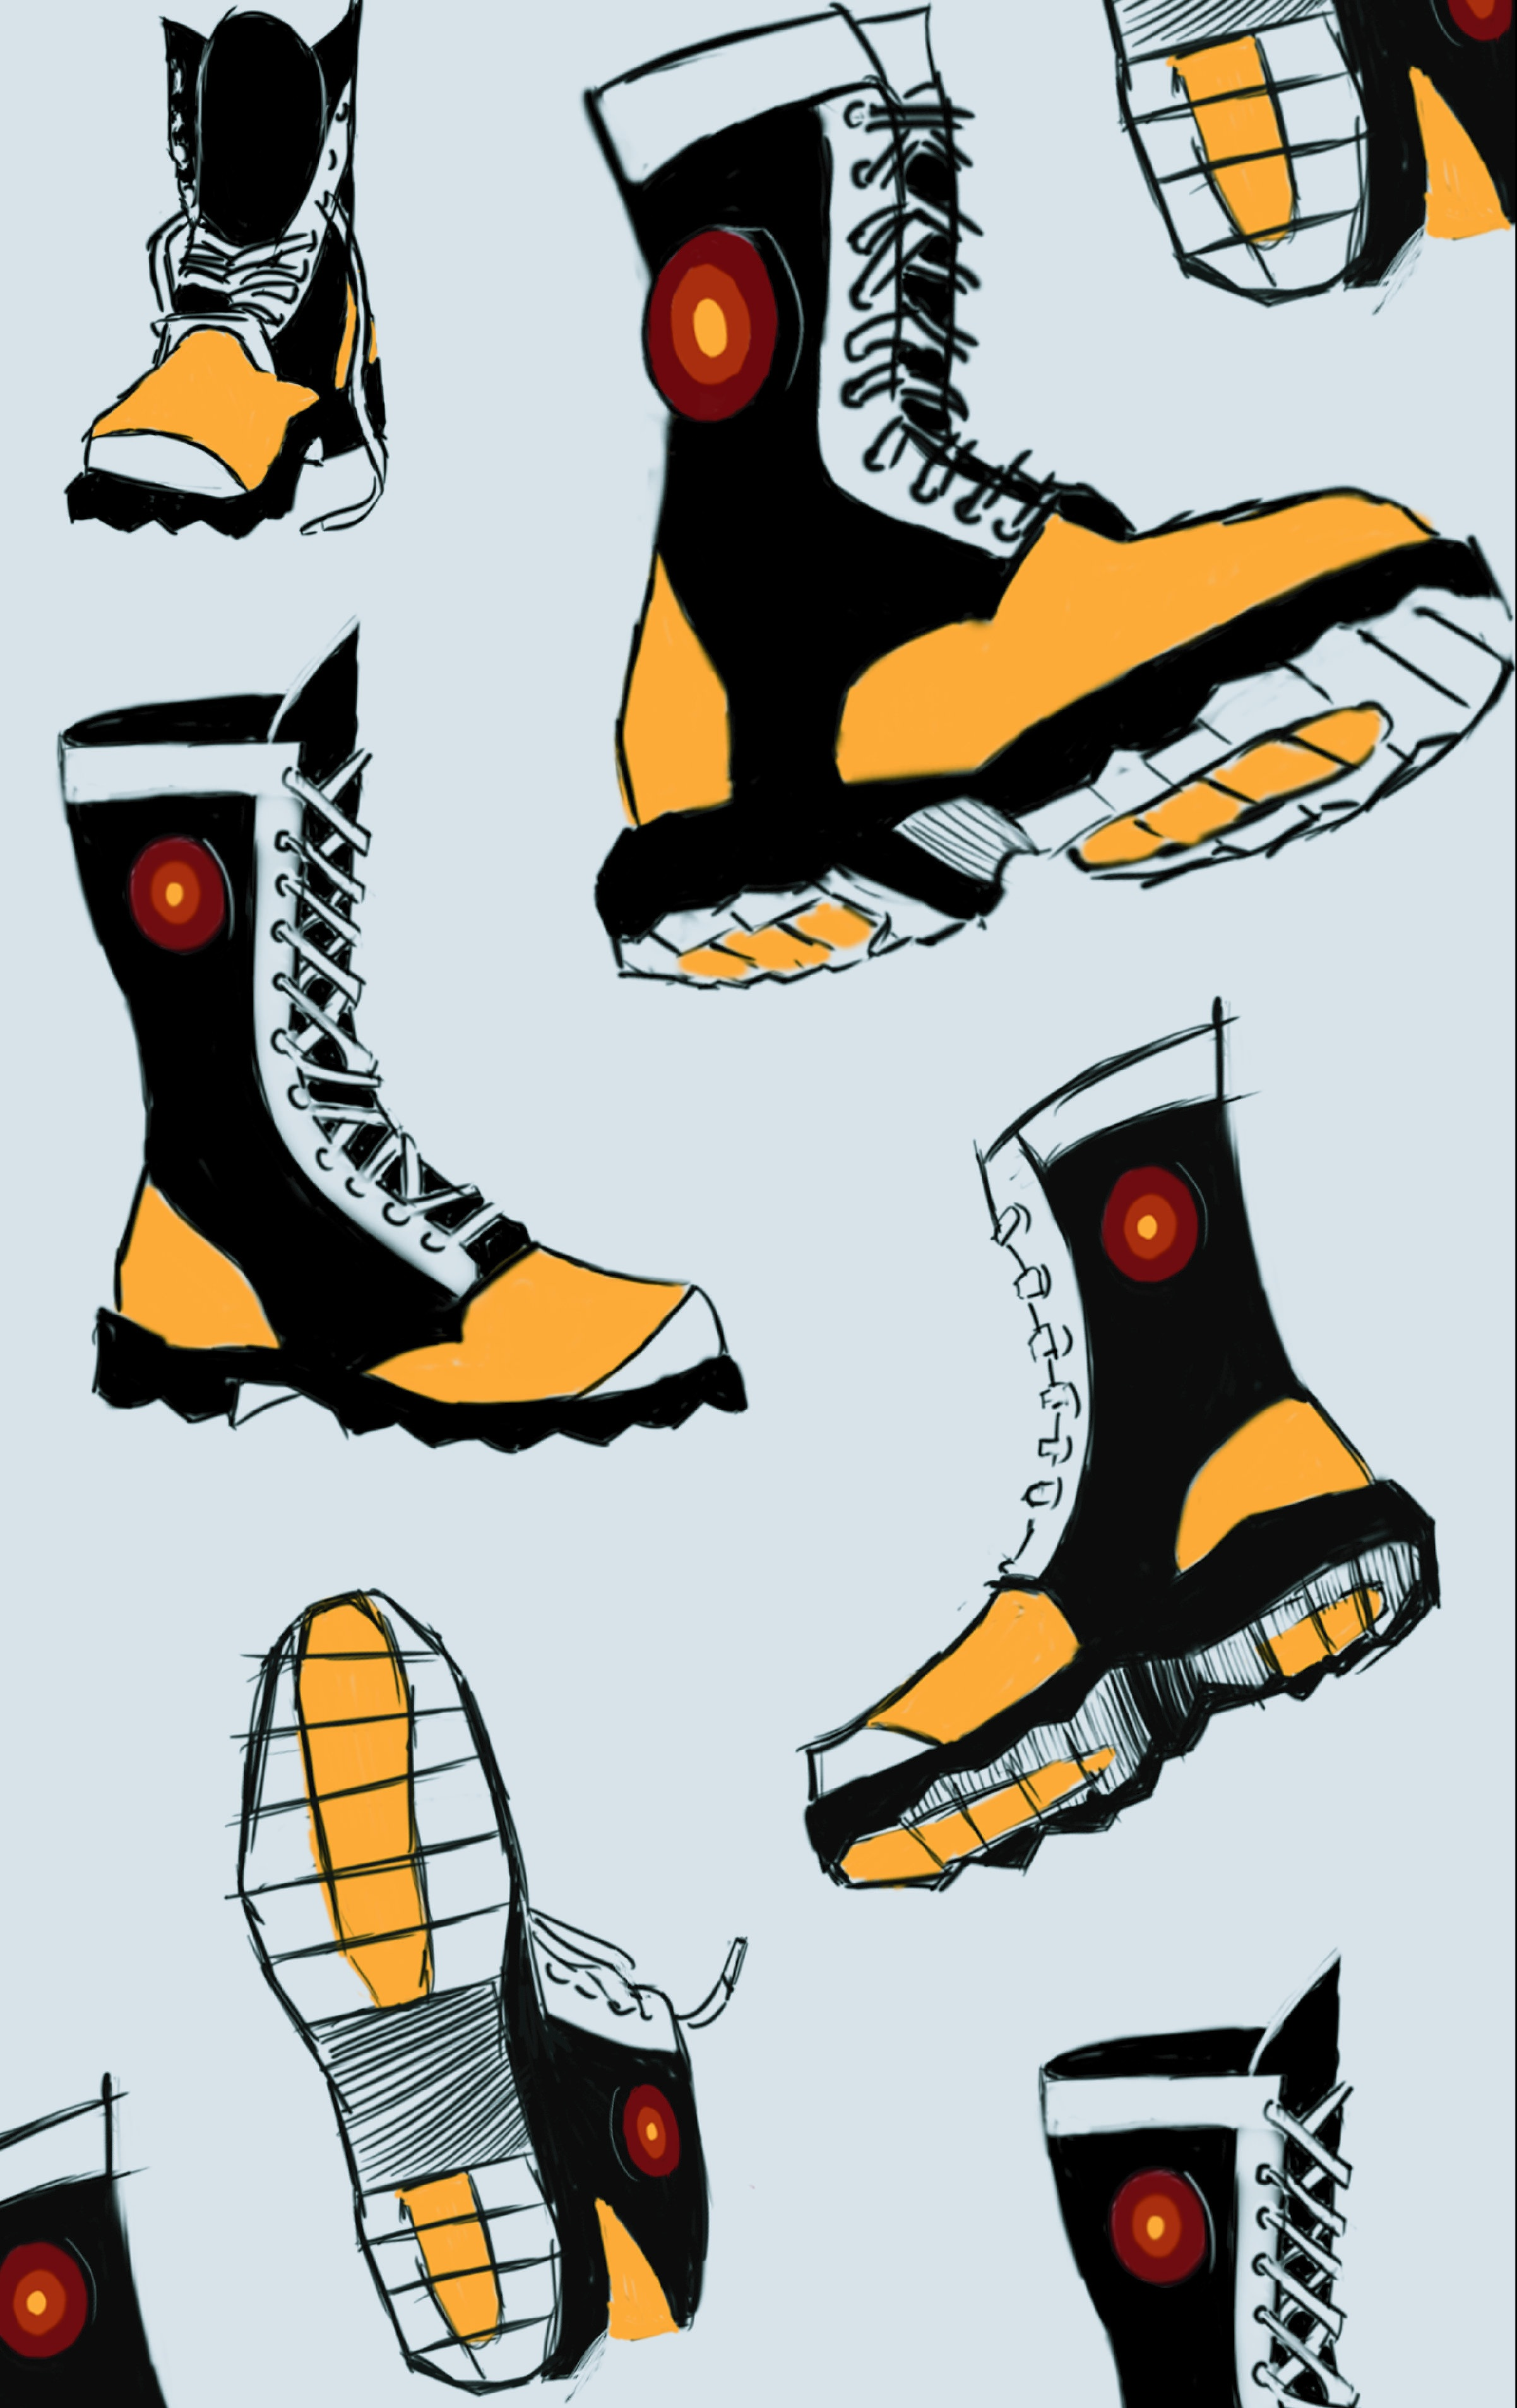 shoe+sketch+1-07.jpg